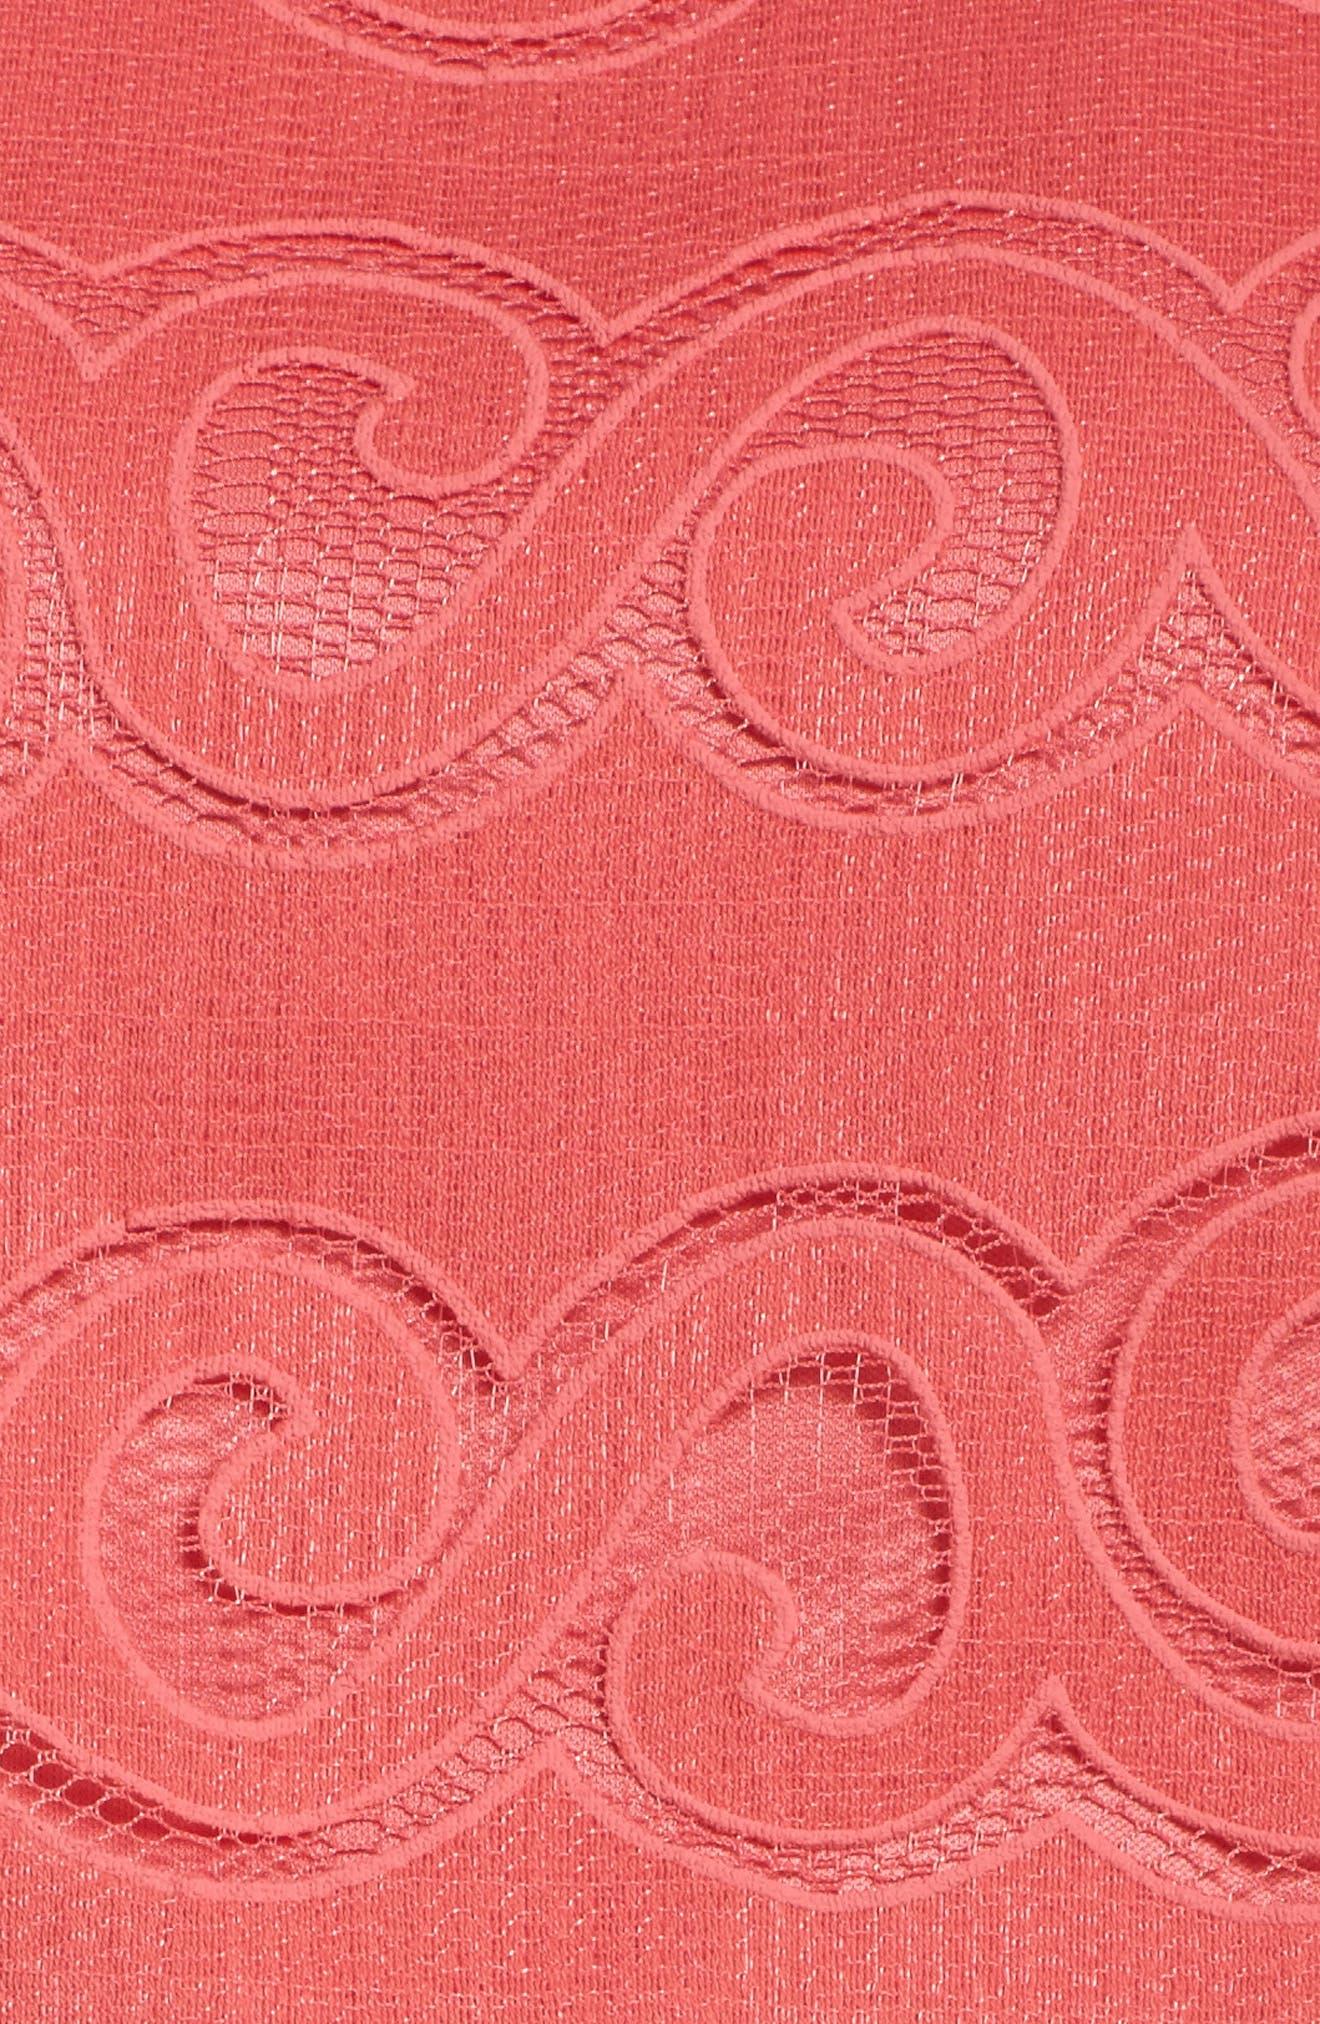 Sleeveless Scallop Hem Sheath Dress,                             Alternate thumbnail 5, color,                             Coral